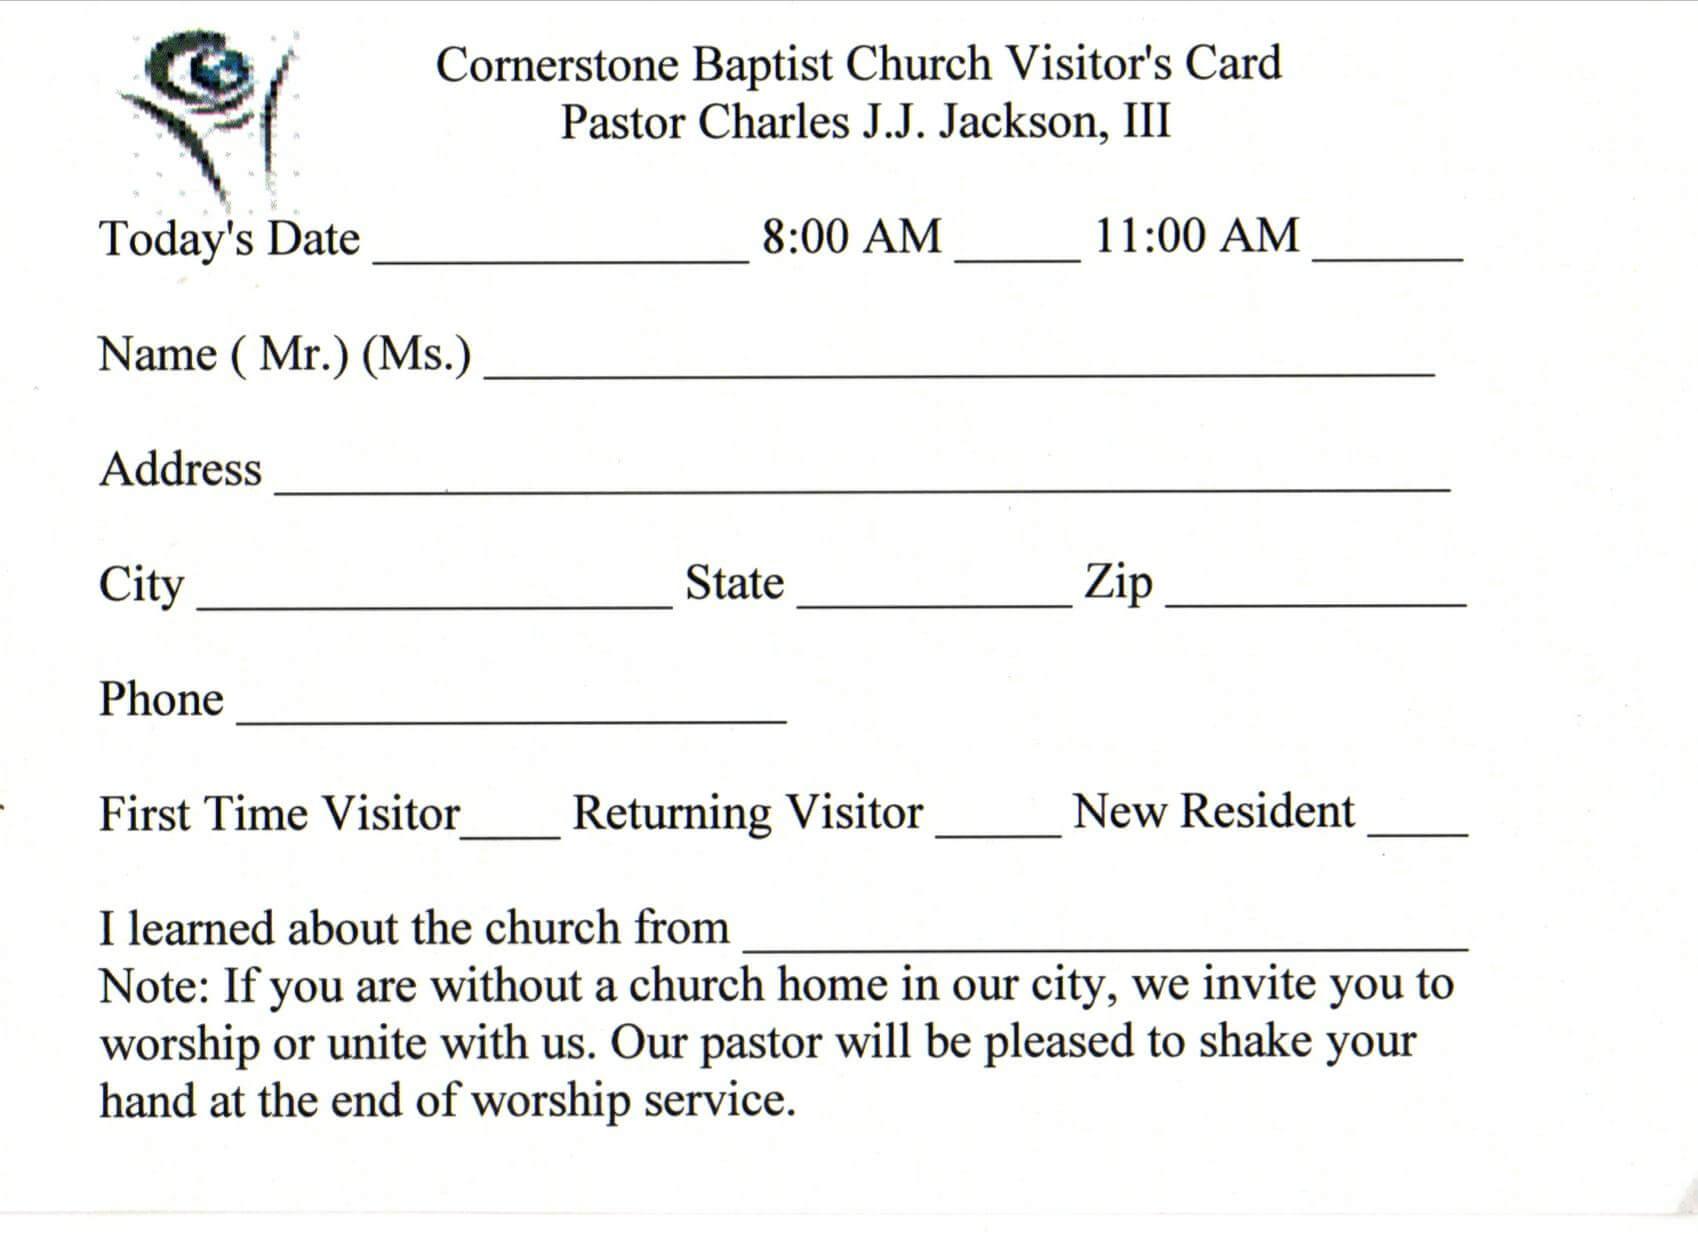 Australian Business Card Template | Business Card Sample Regarding Church Visitor Card Template Word